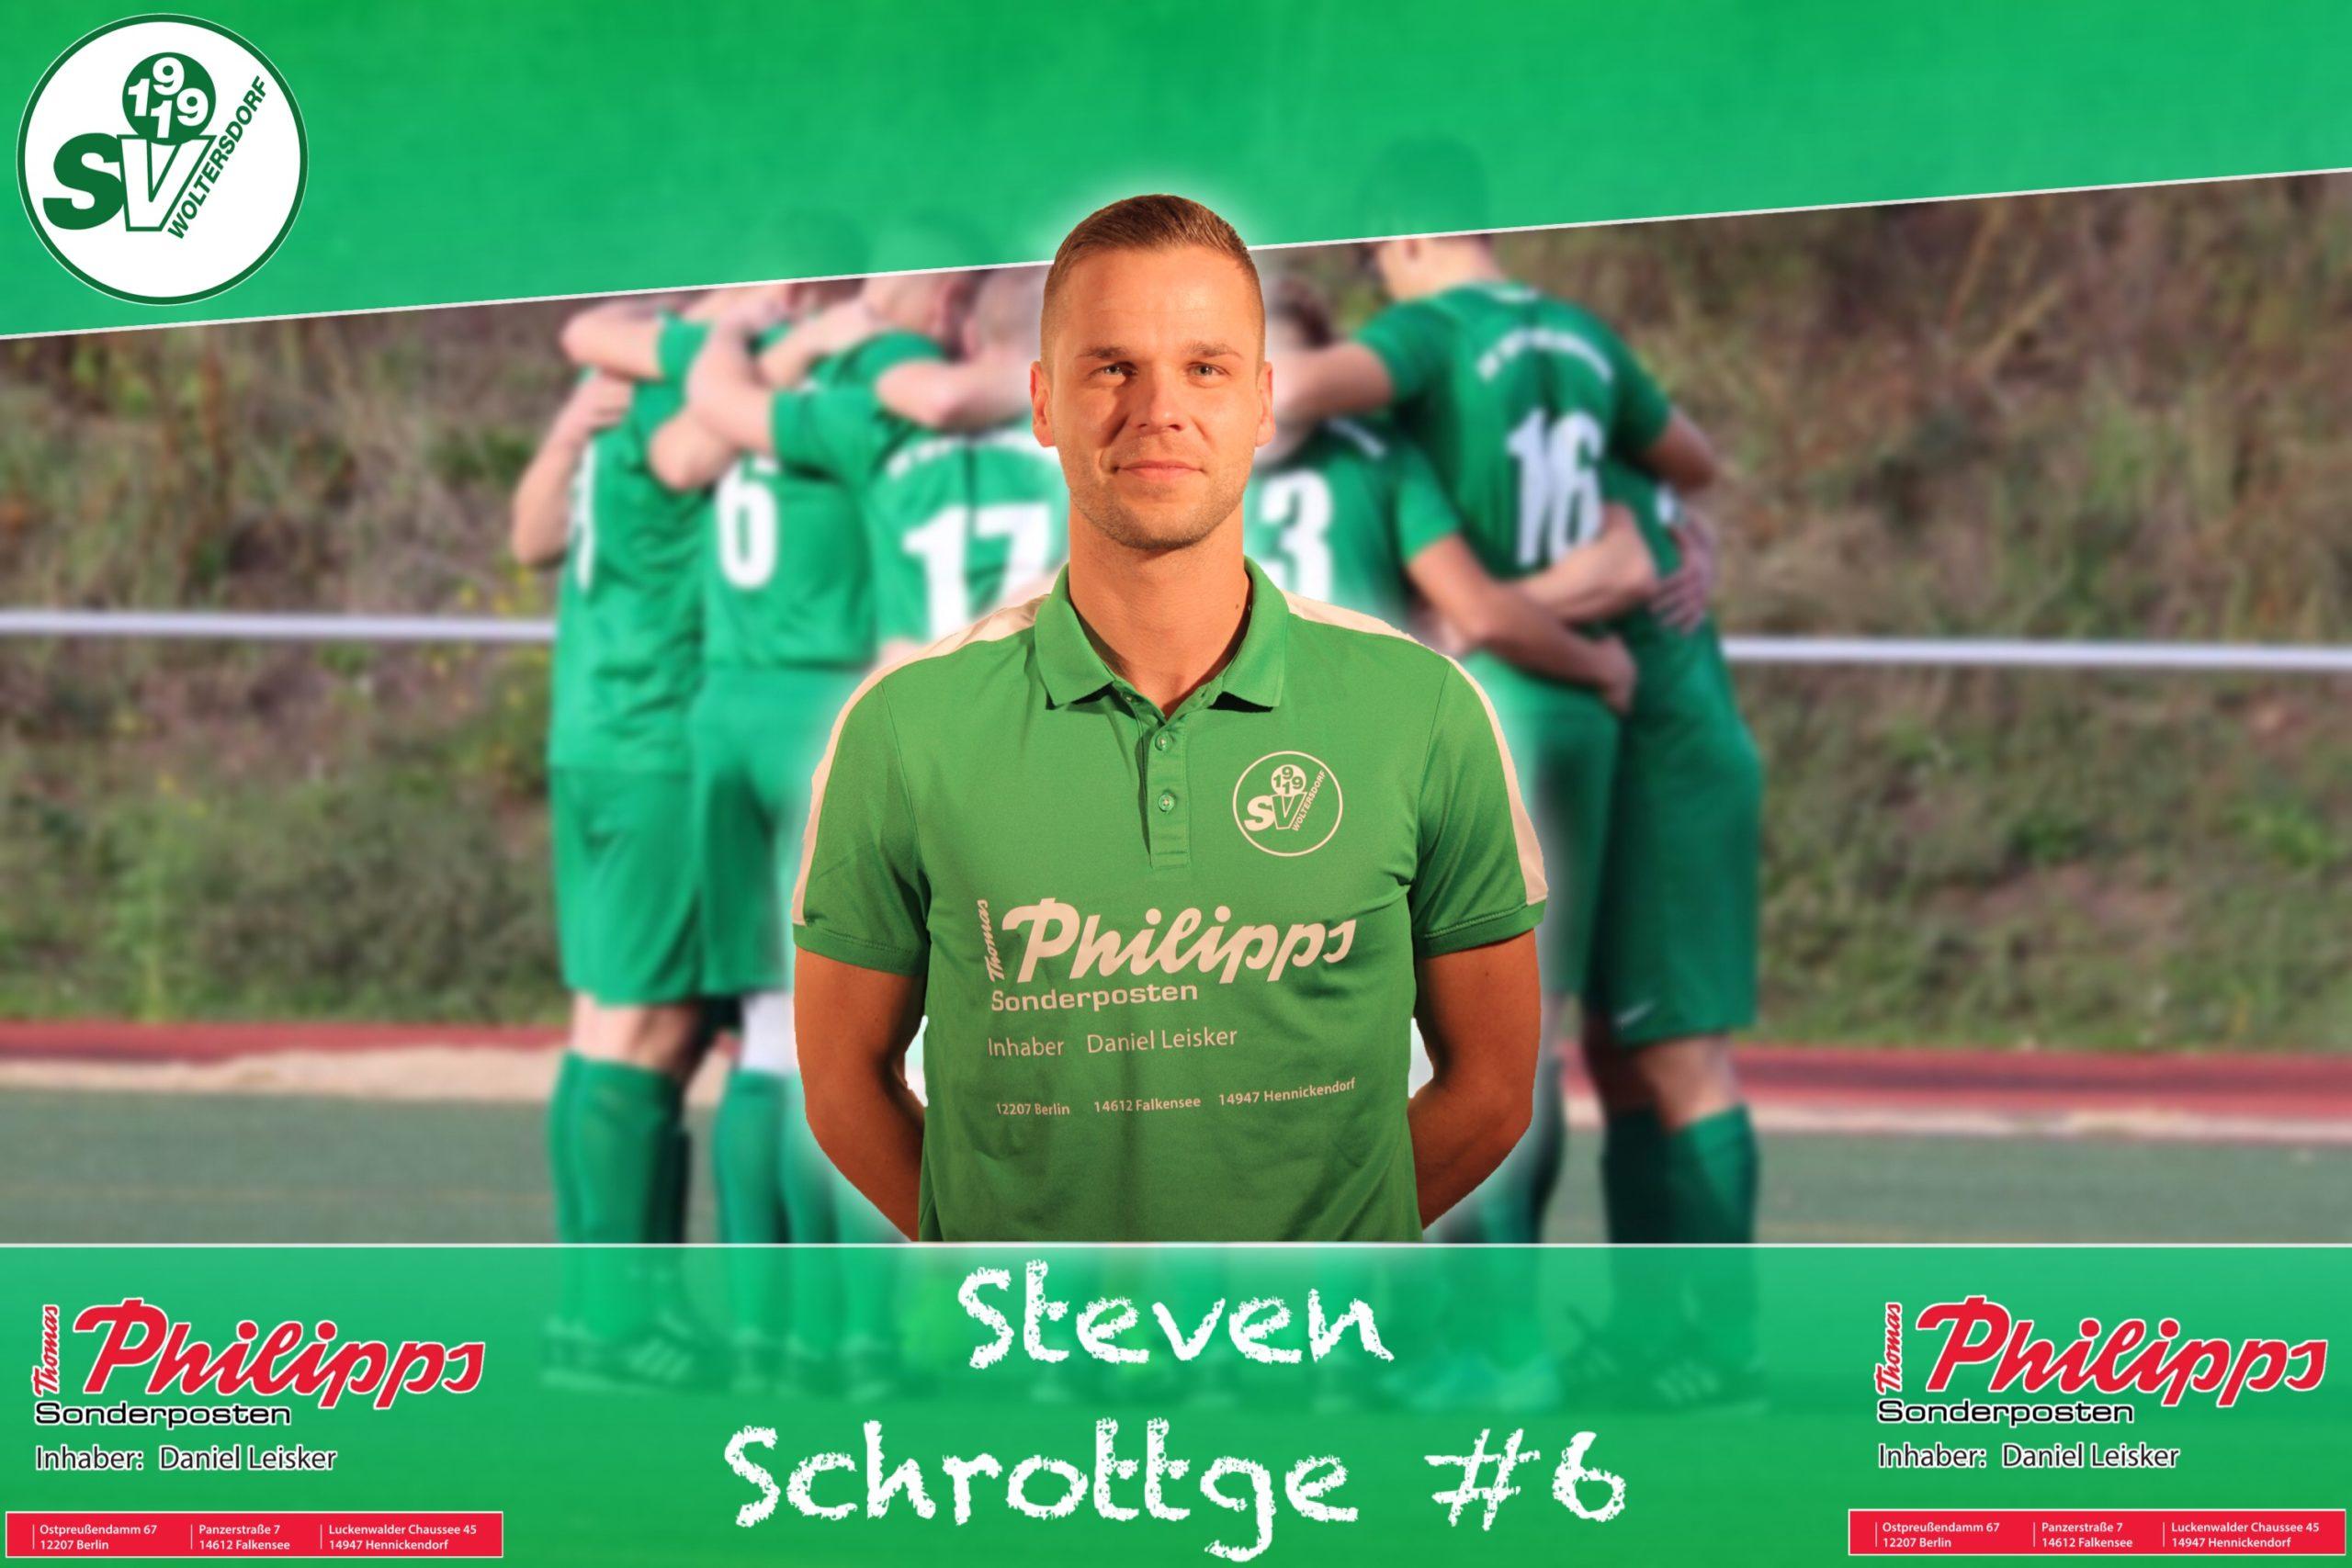 Steven Schrottge